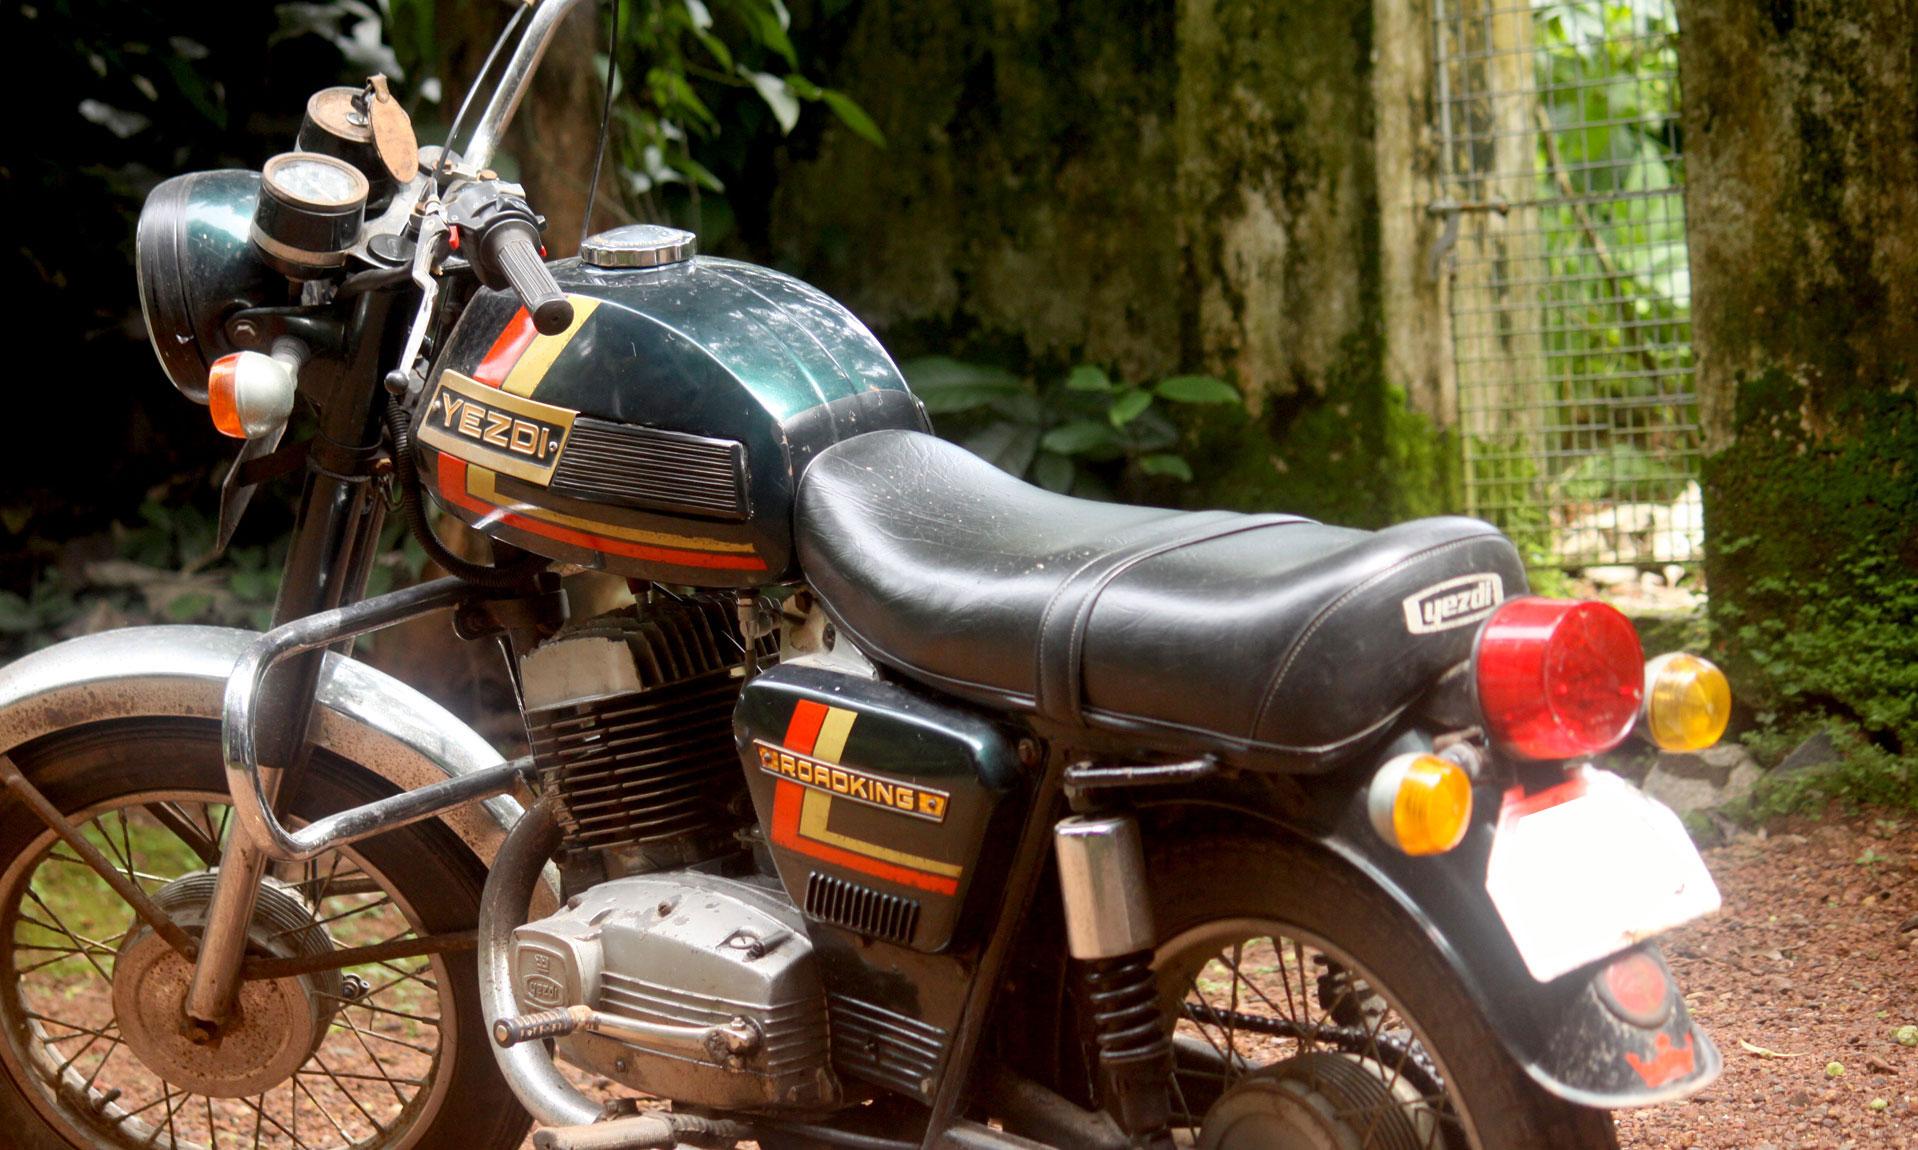 Kerala Vintage Vehicles - Old cars, bikes, trucks and buses